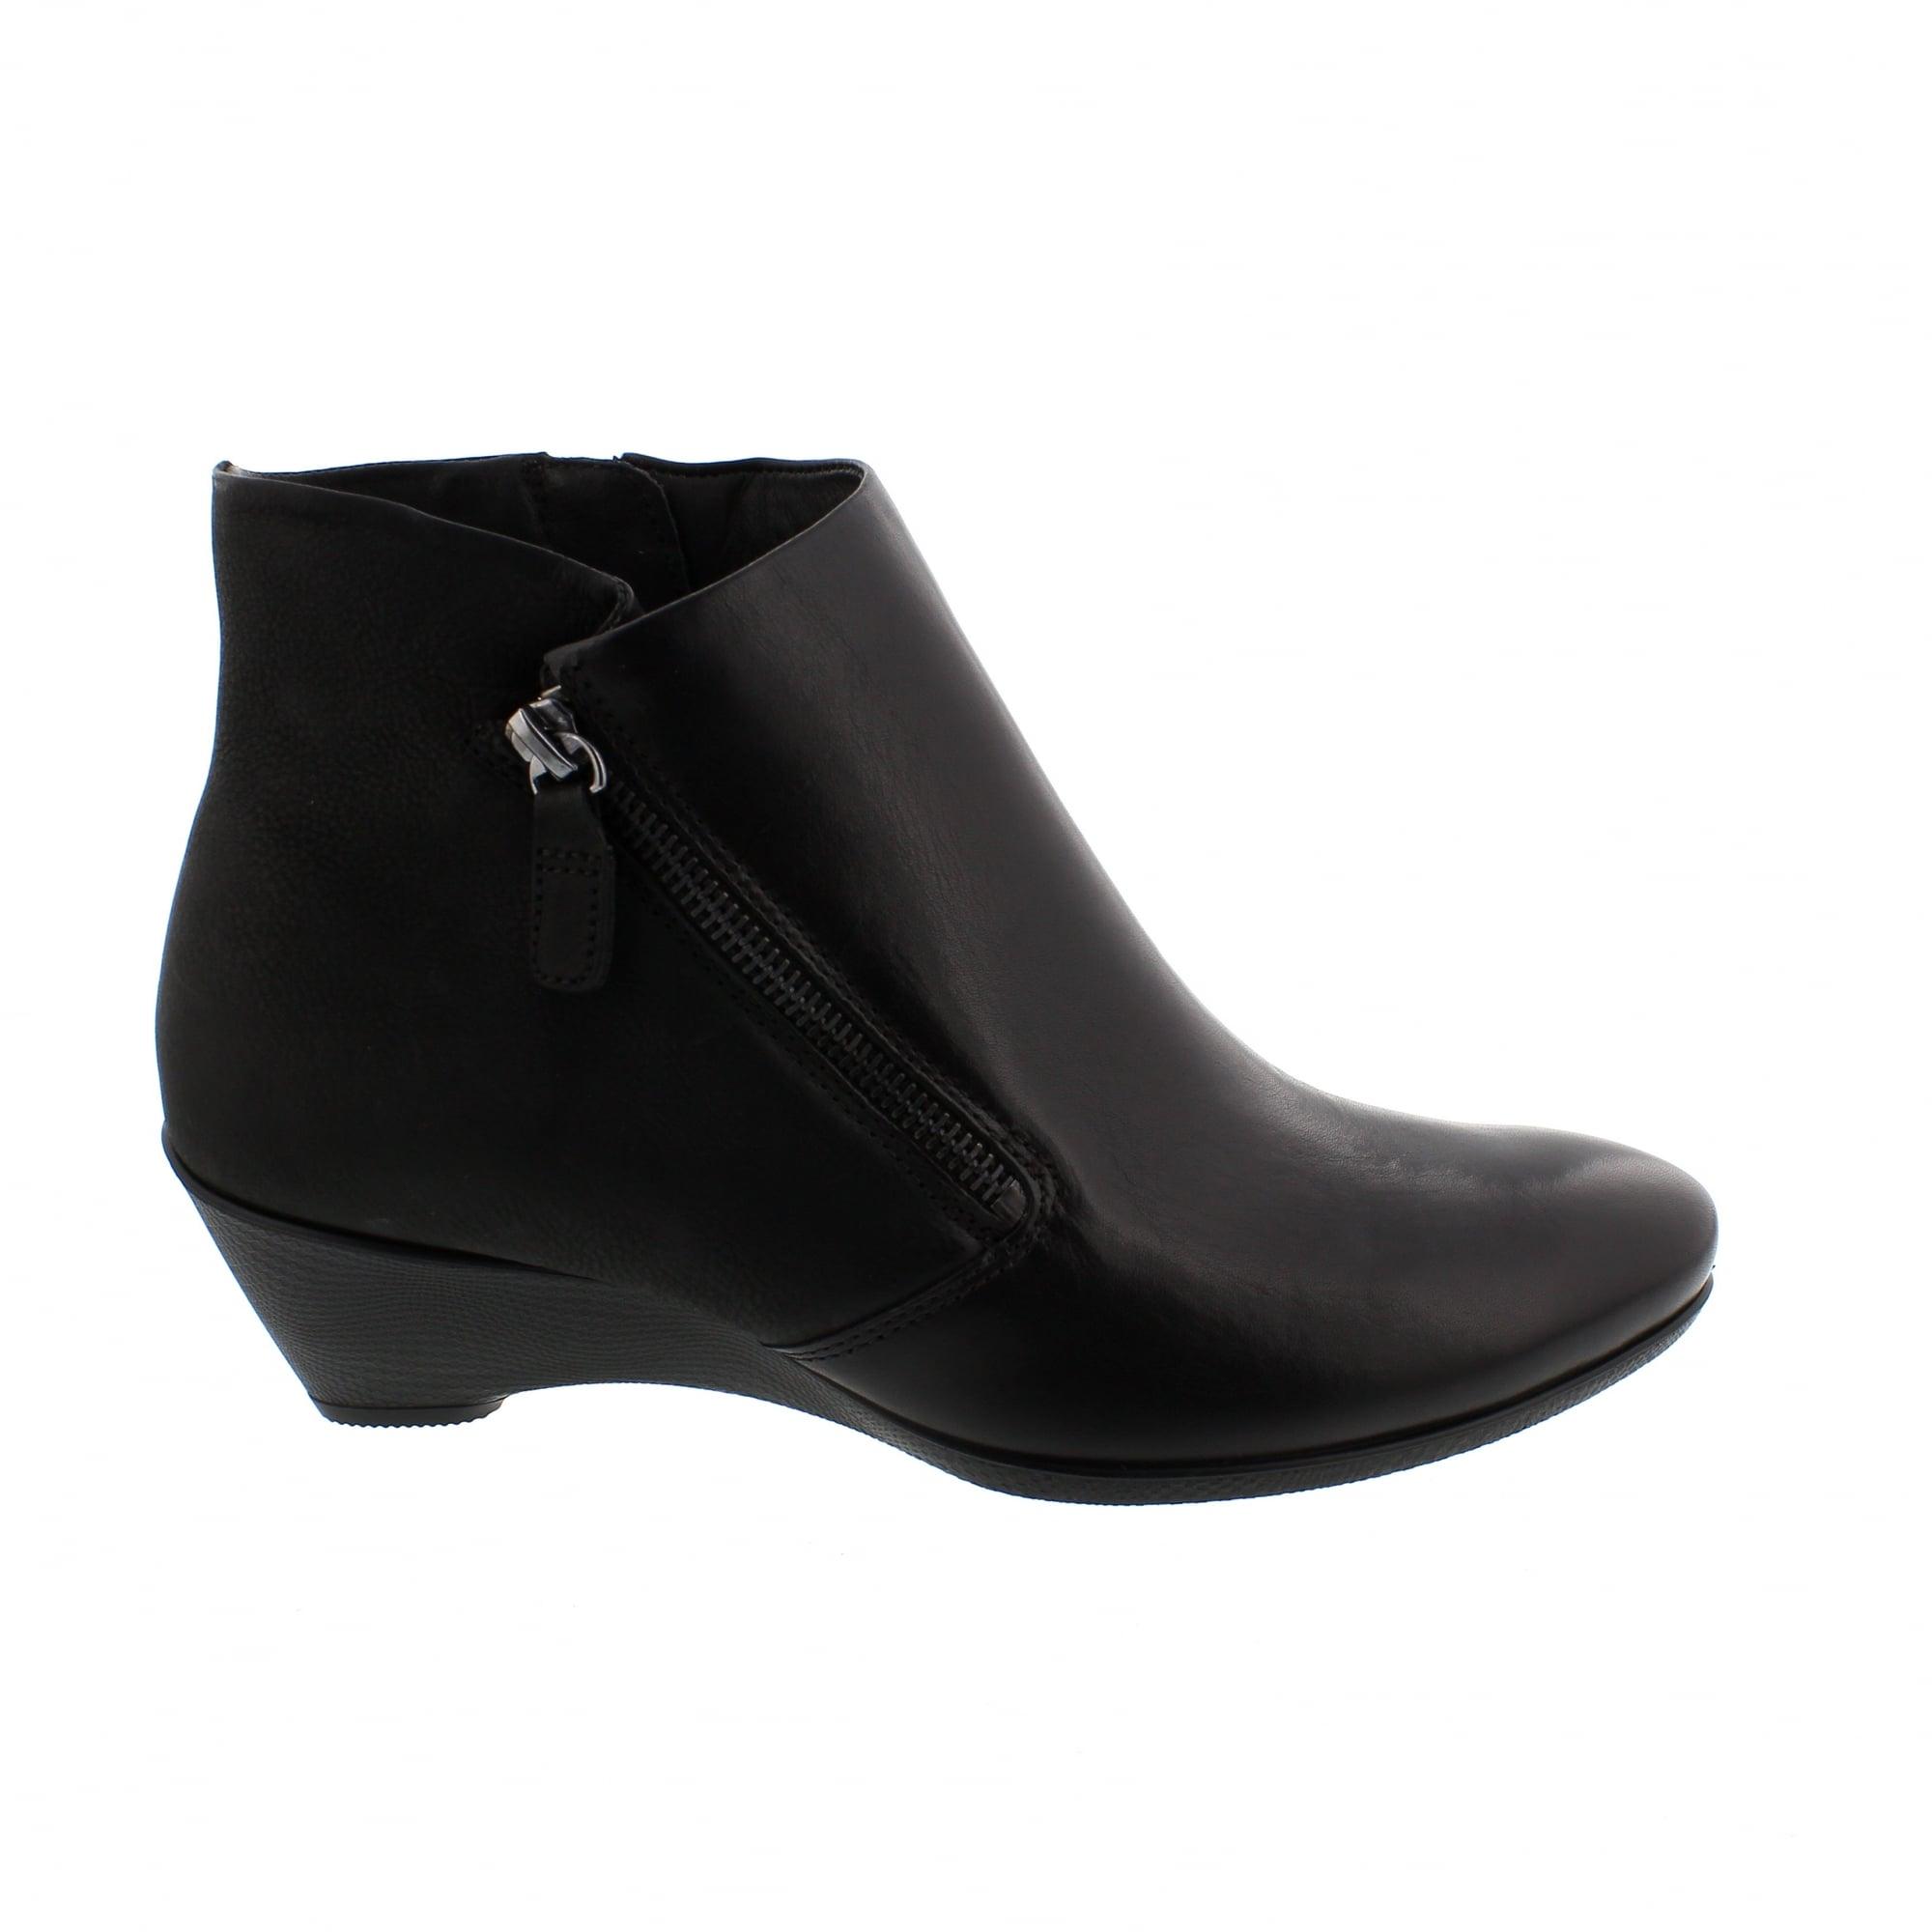 7e20ddf64813b7 Ecco Sculptured 45 270043-51052 Womens Ankle Boots